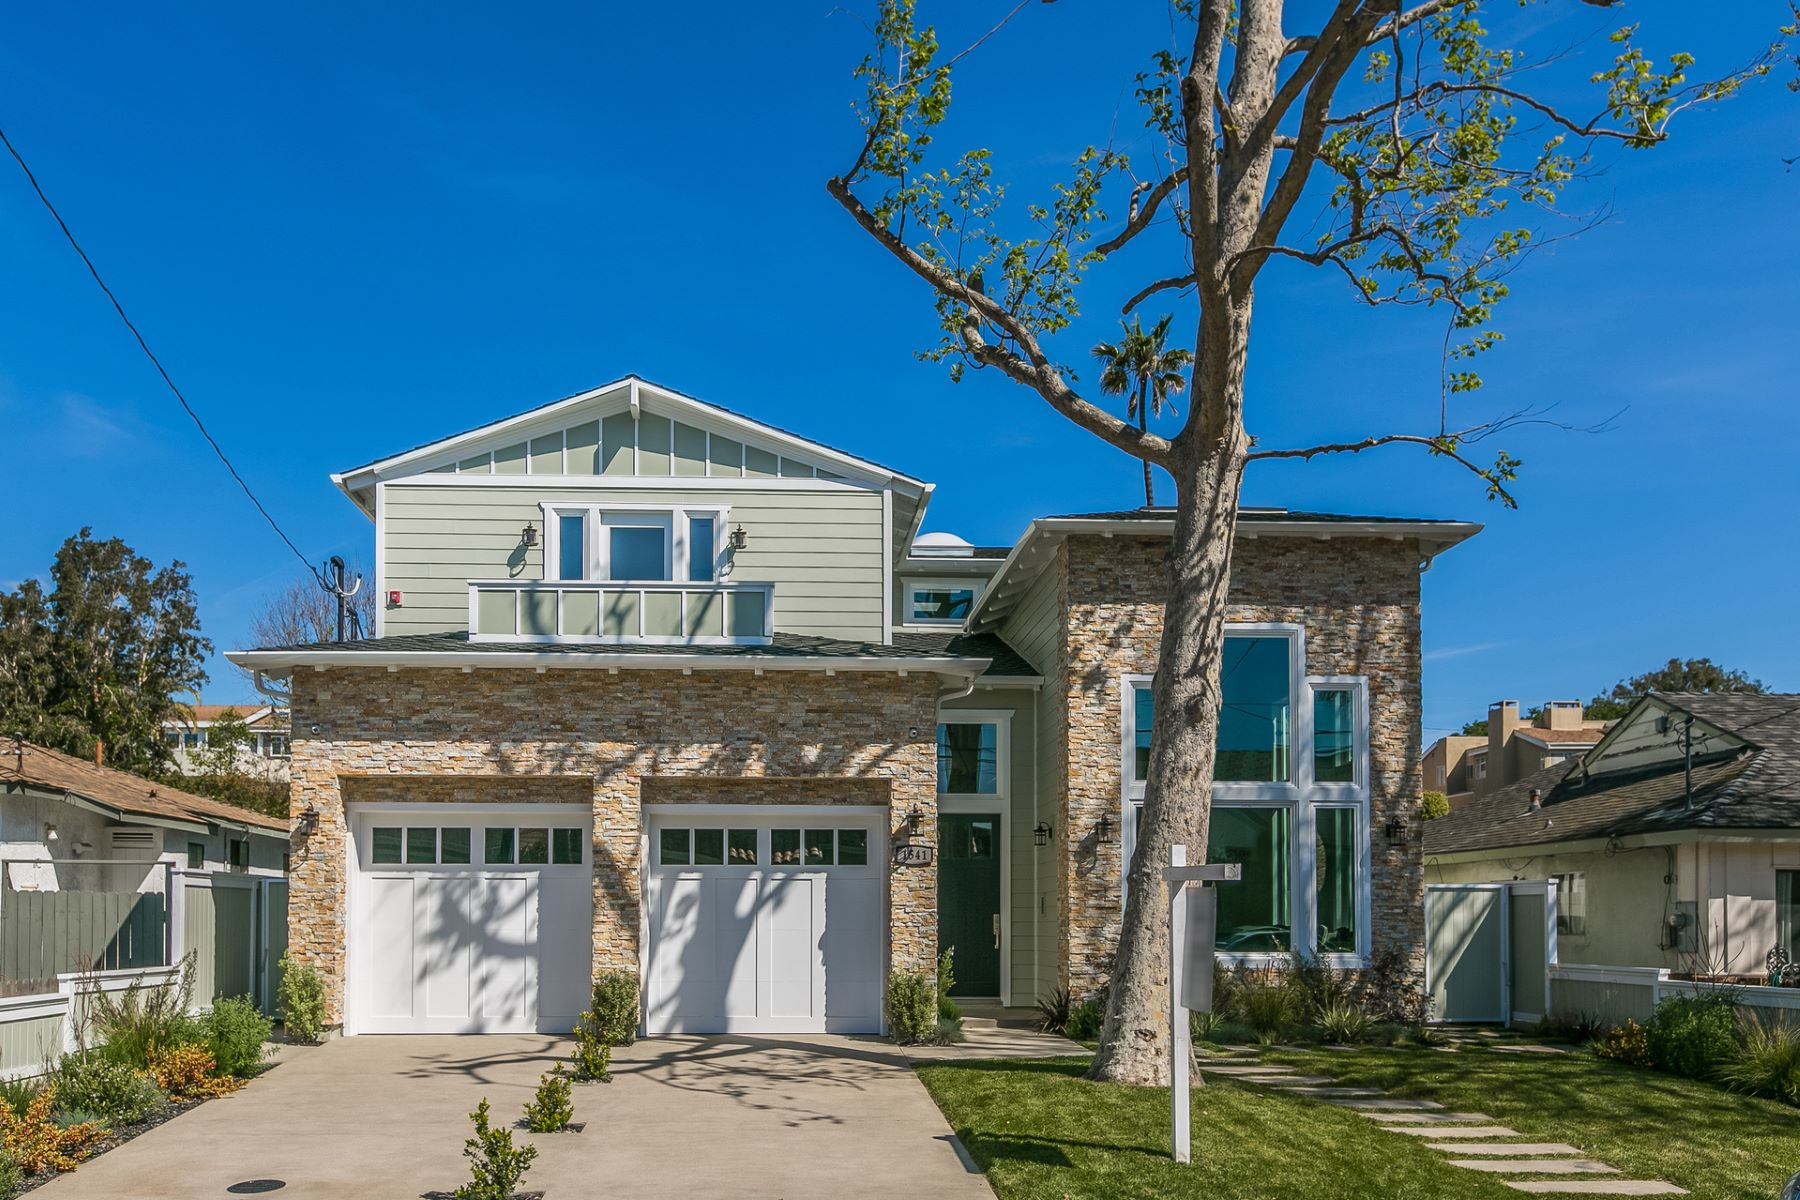 Single Family Home for Sale at 1541 Nelson Av, Manhattan Beach 90266 Manhattan Beach, California 90266 United States